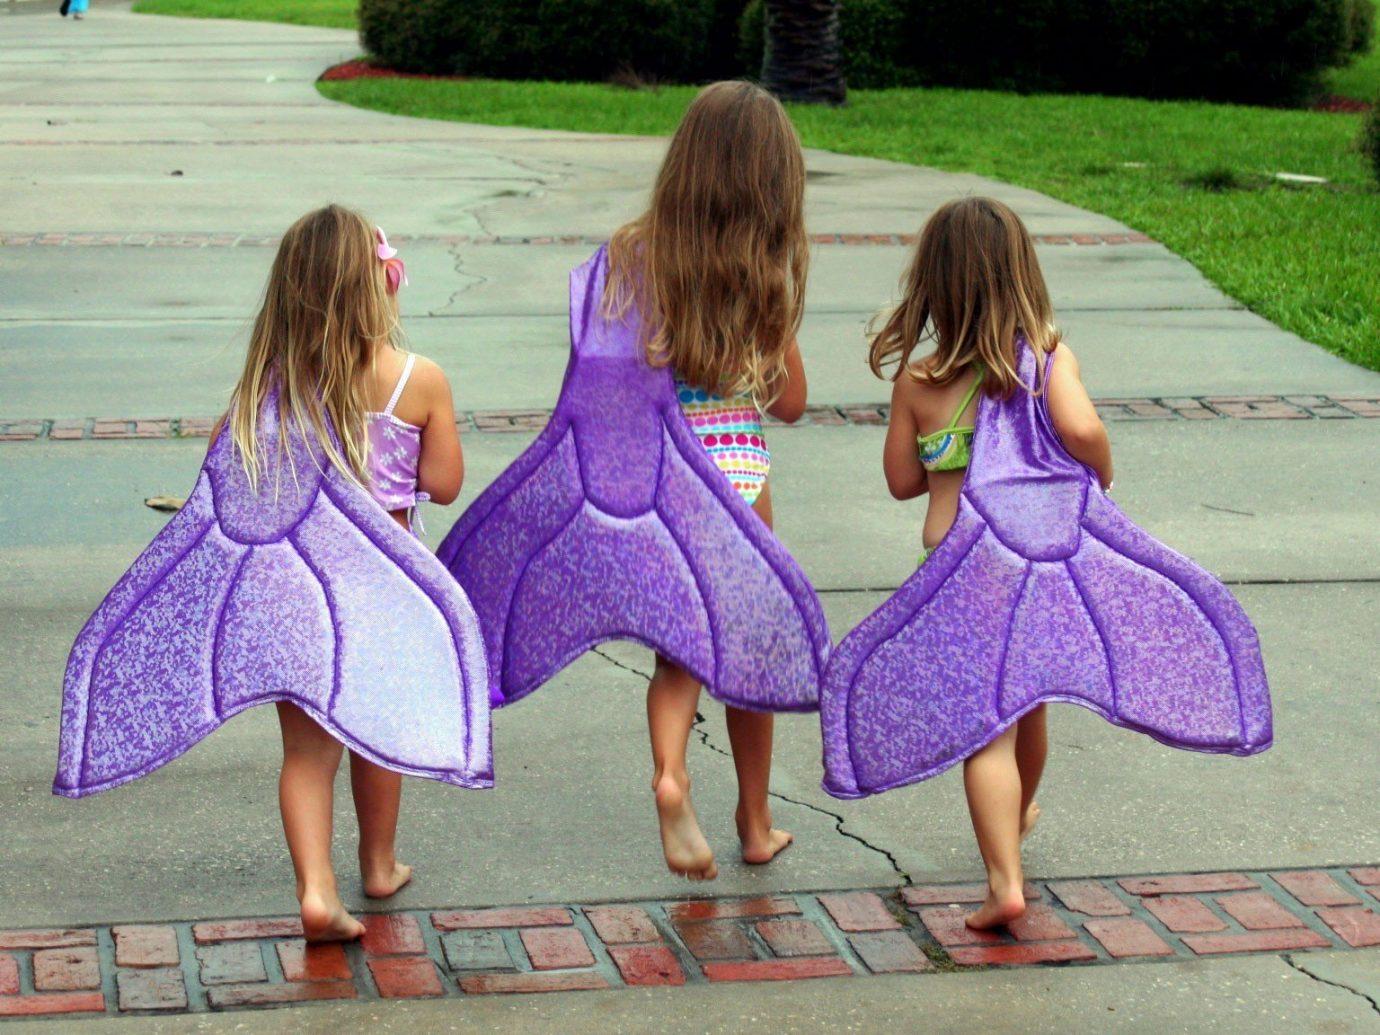 Trip Ideas outdoor grass ground person girl little people dress child purple